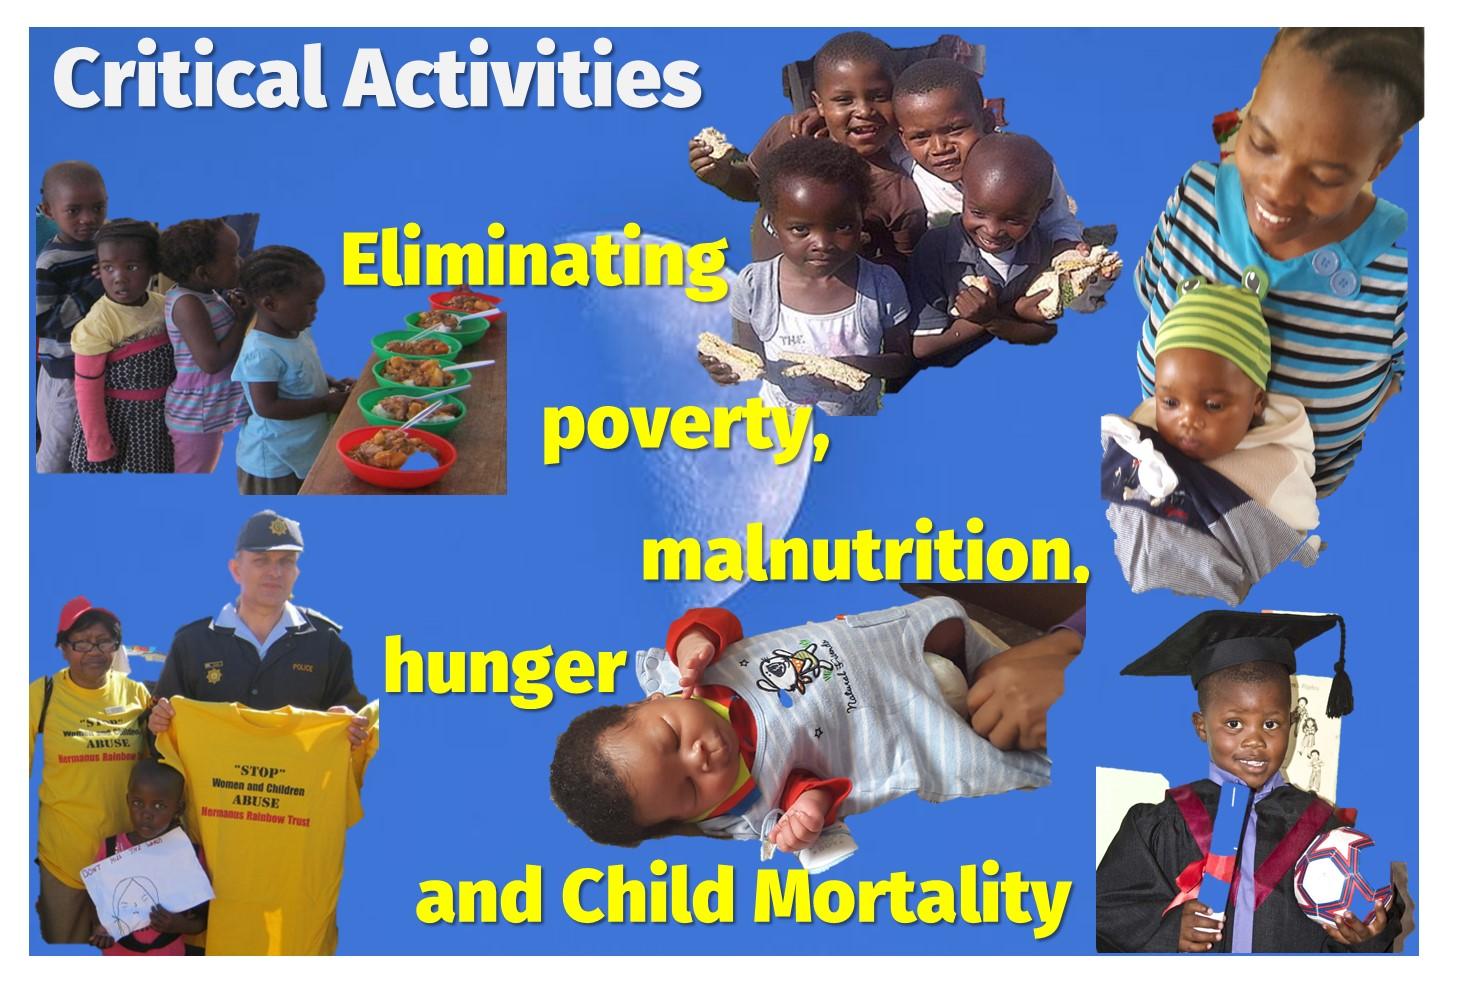 Critical activities